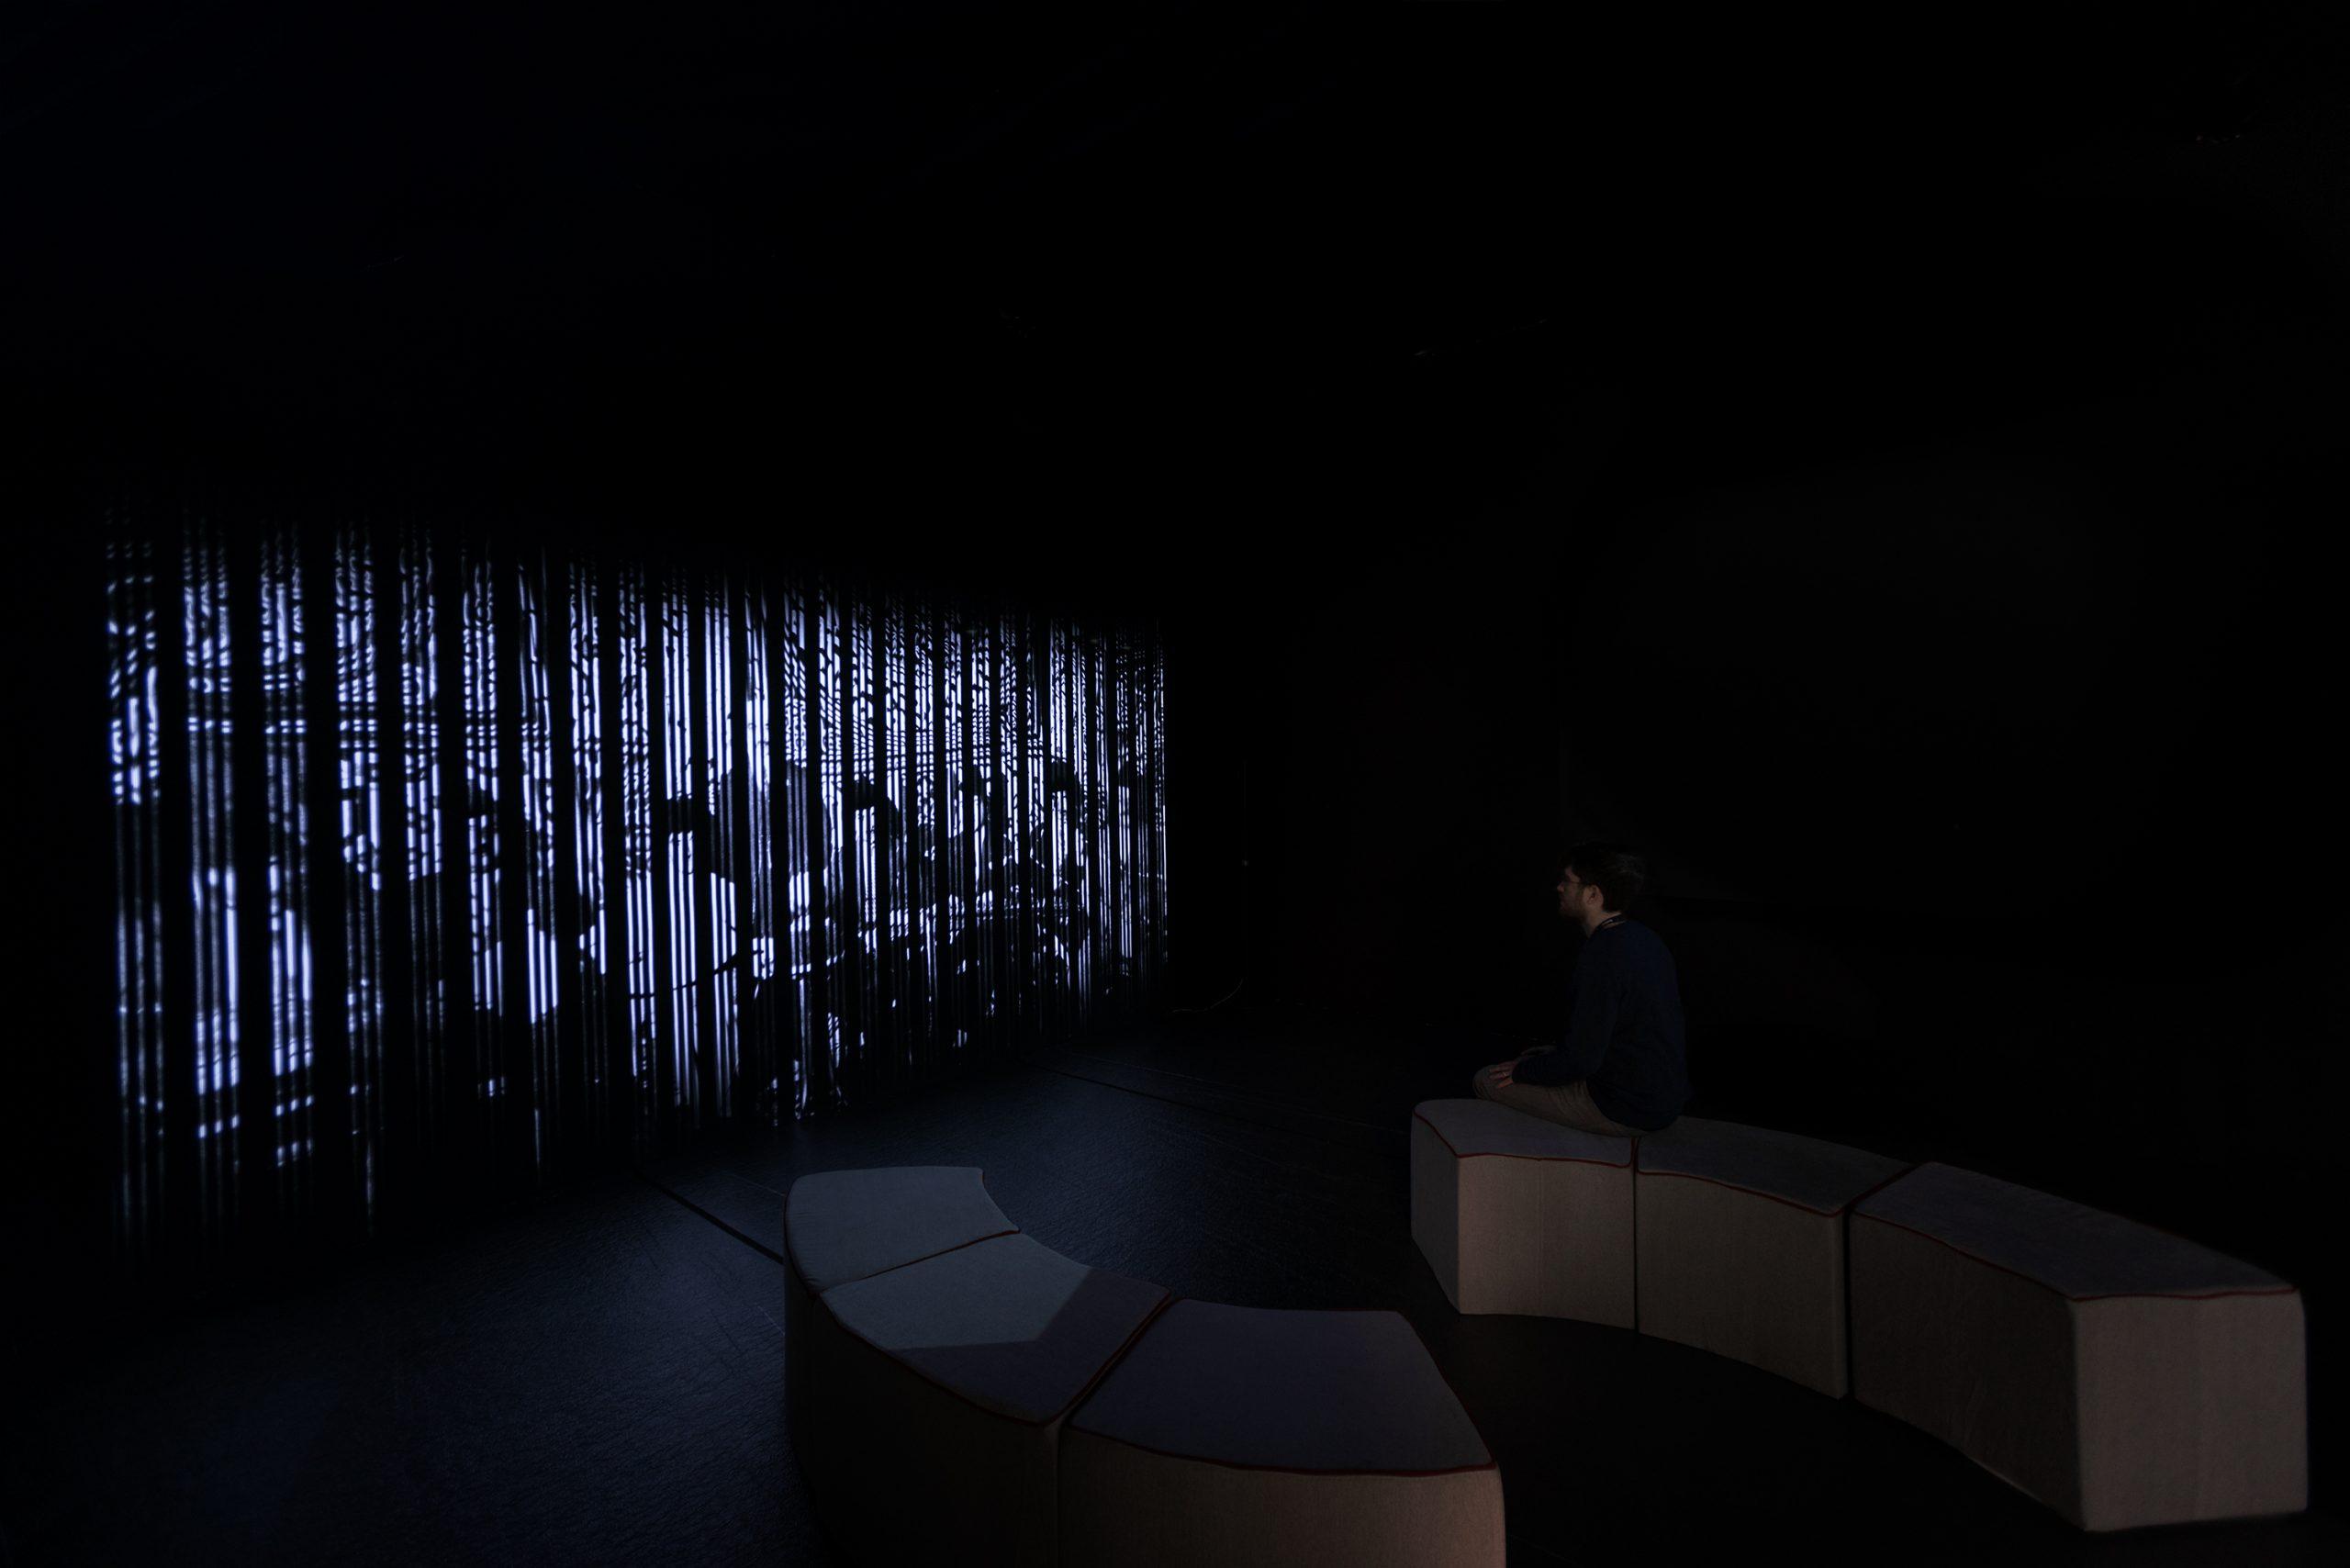 Maqamat installation view, Artissima 2018